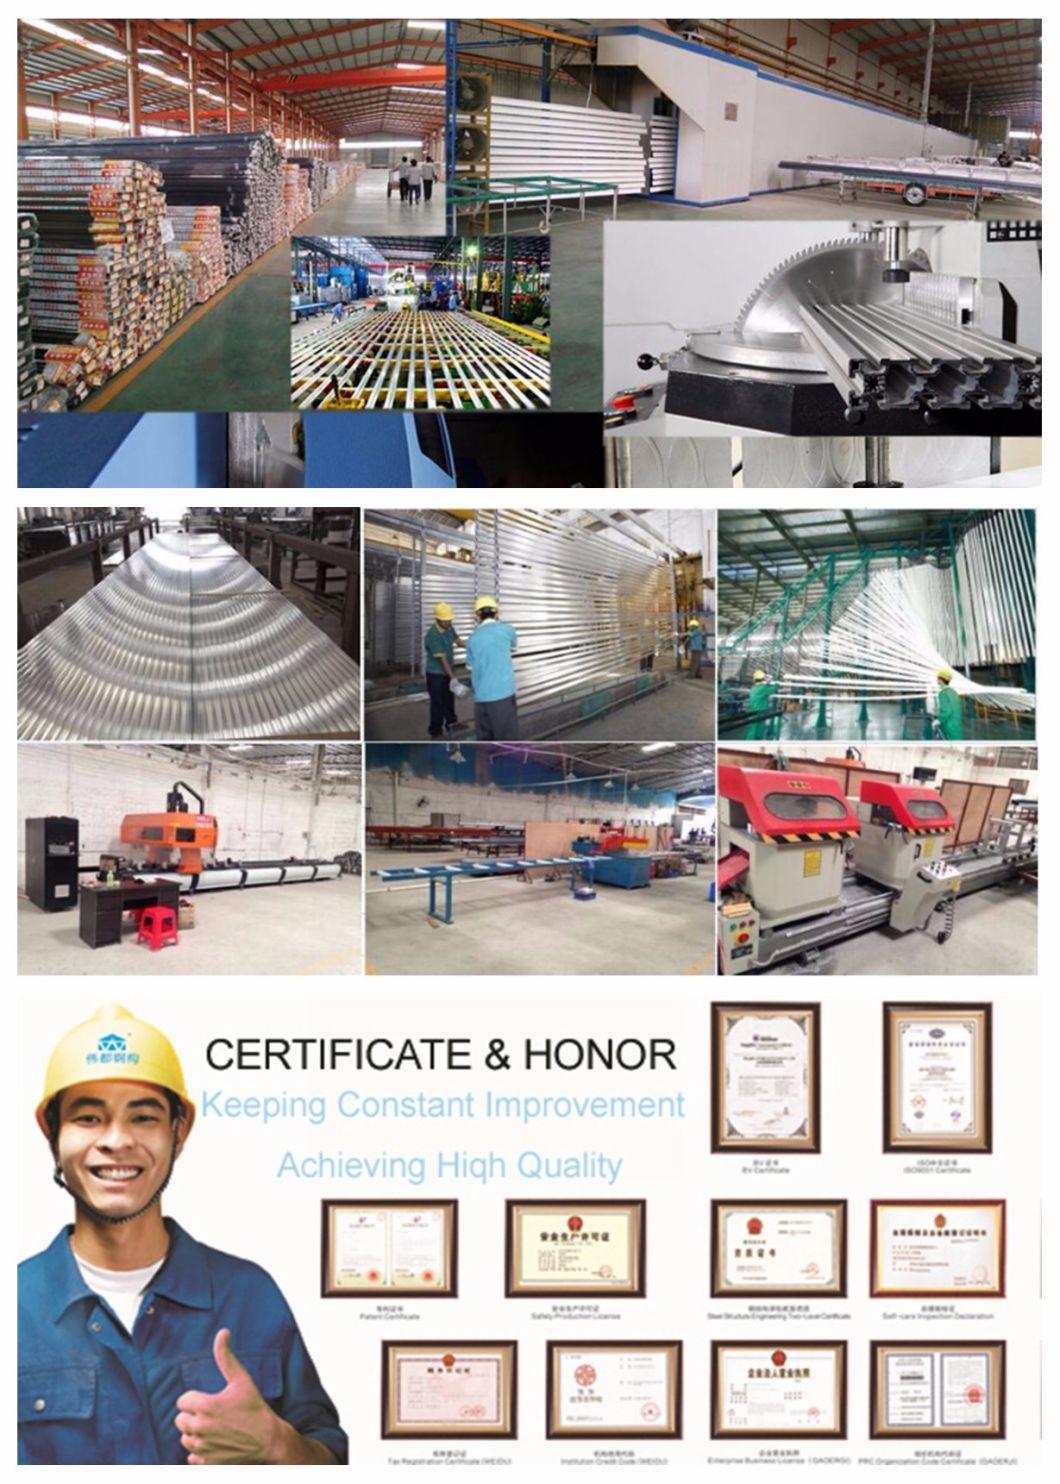 DIY Polycarbonate Ce Certificate Patio Cover